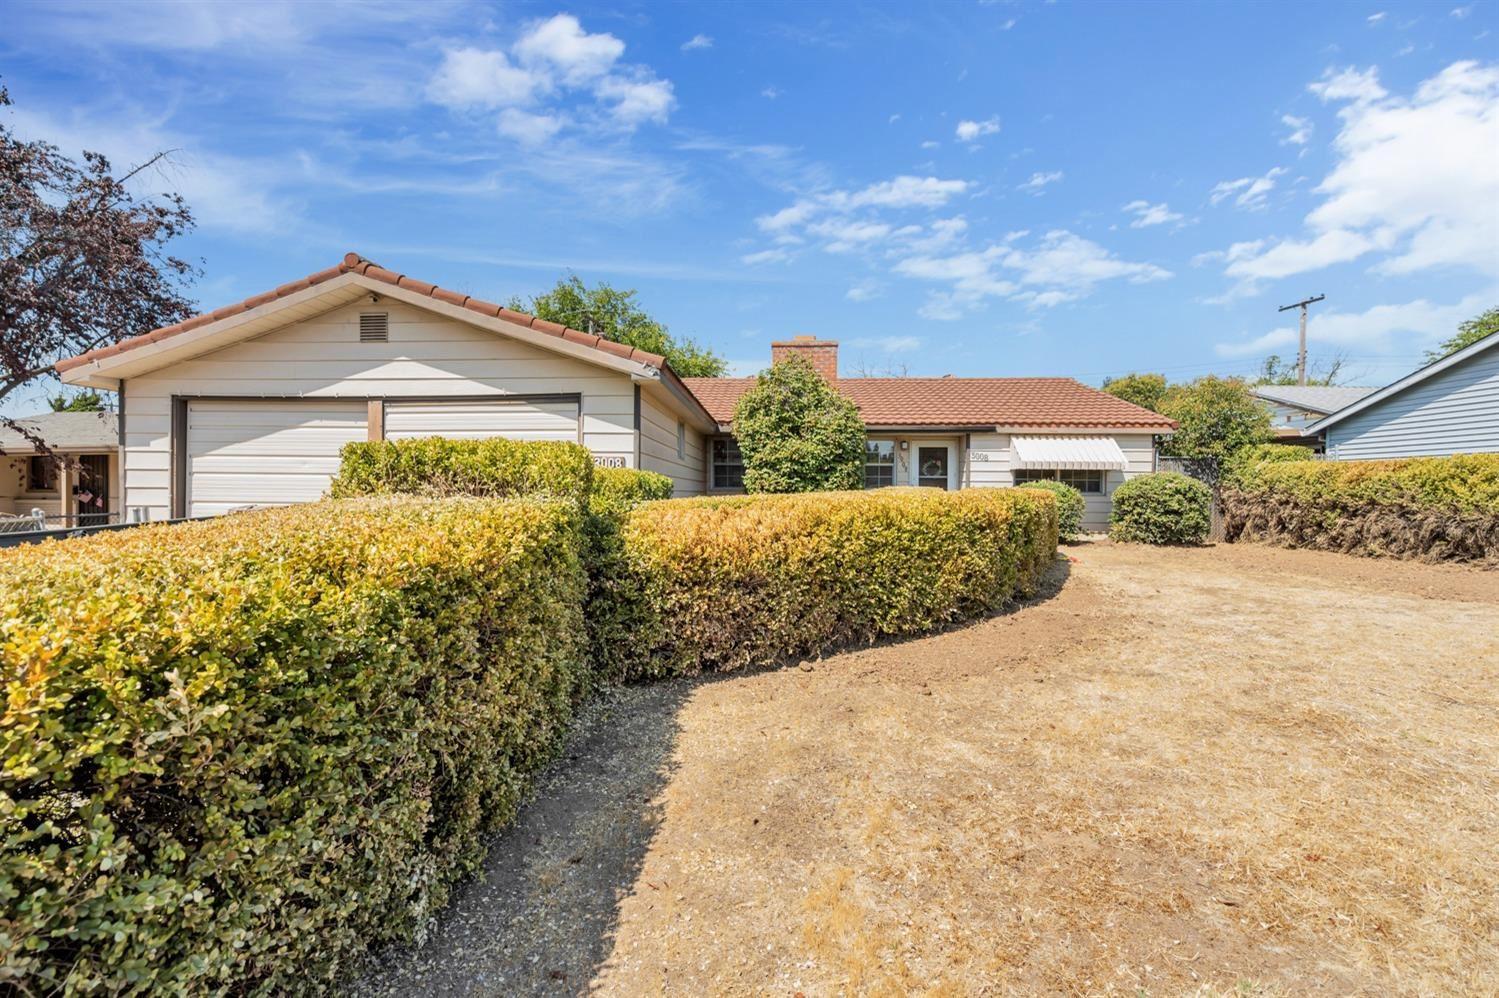 Photo of 3008 Mills Park Drive, Rancho Cordova, CA 95670 (MLS # 221114838)